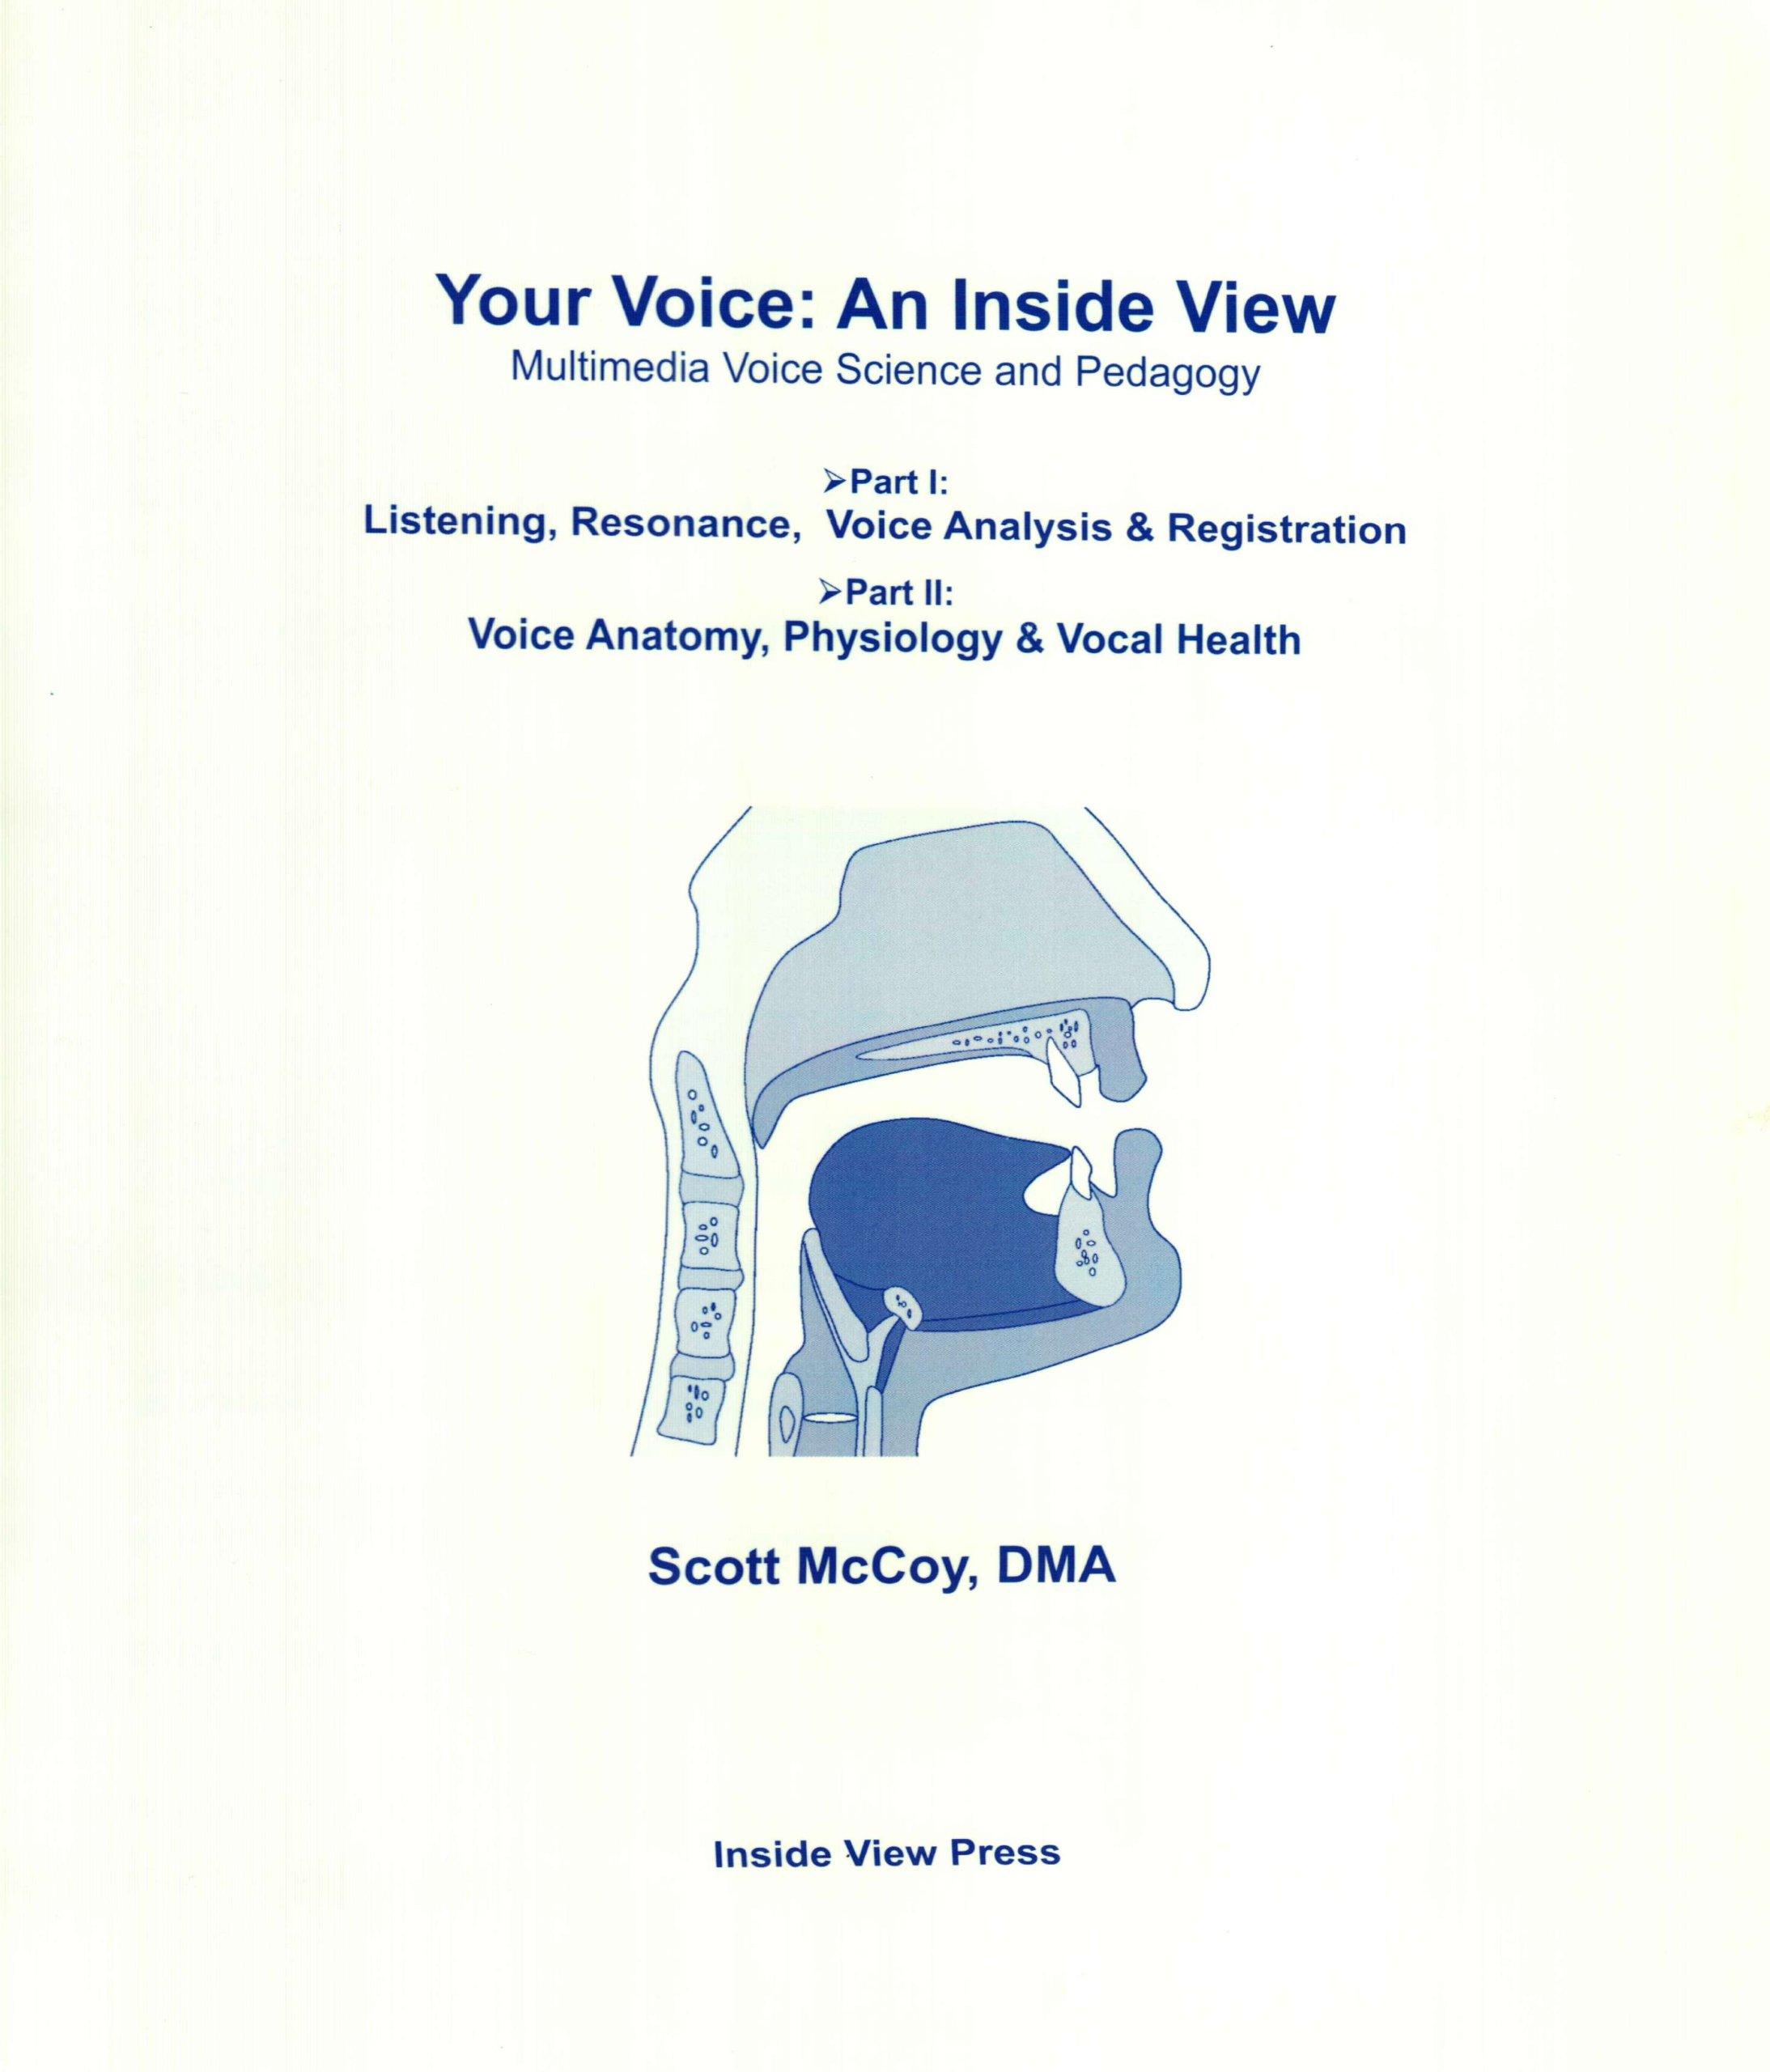 Voice Science 19851995 Yamaha Moto4 200 225 250 350 Service Repair Manual Speech W Access Array Your An Inside View Multimedia And Pedagogy Rh Amazon Com